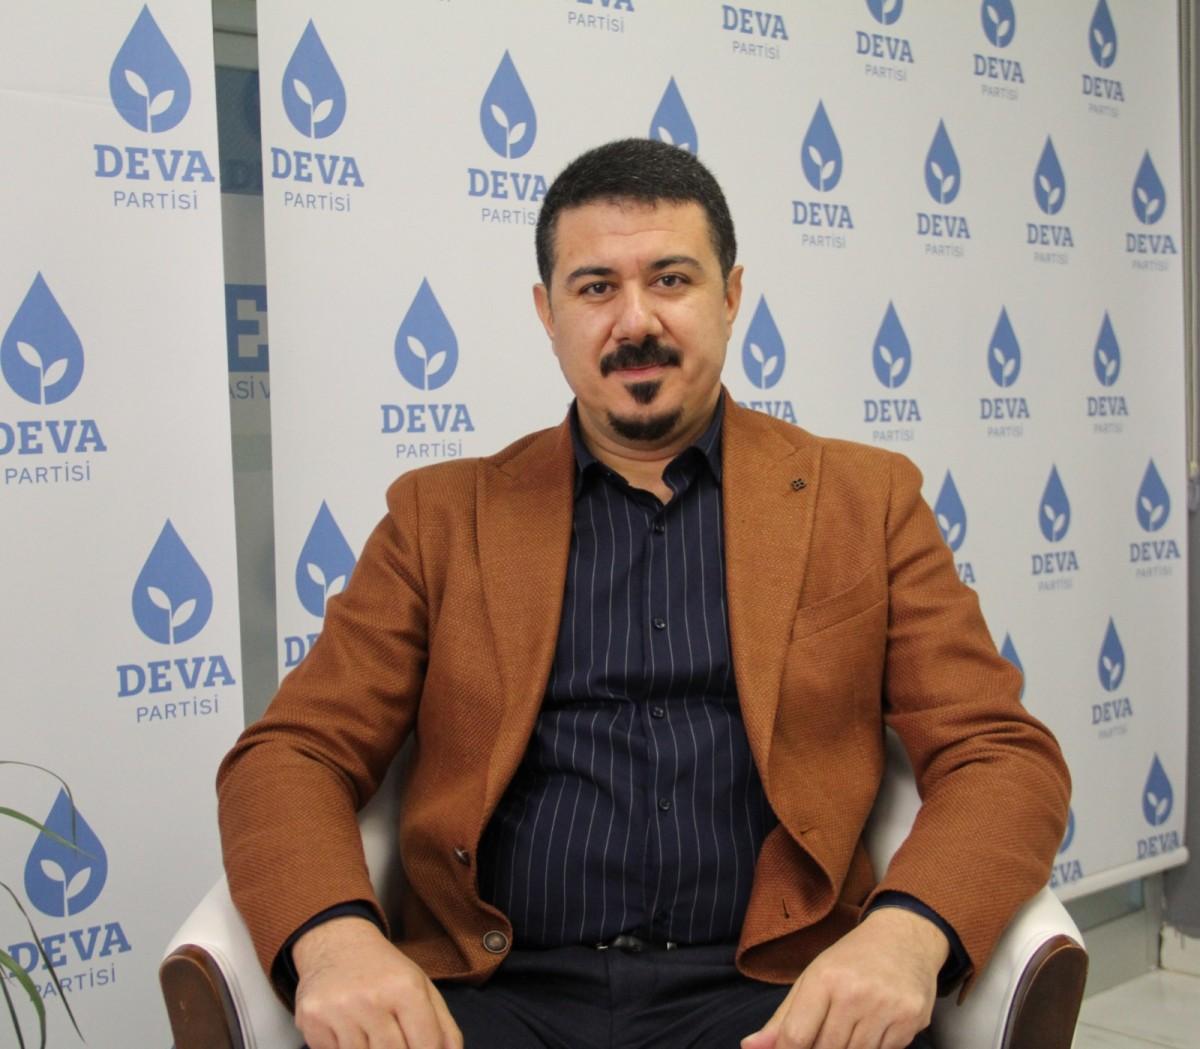 DEVA Partisi İl Başkanı Mesut Aydoğan'dan bayramı mesajı